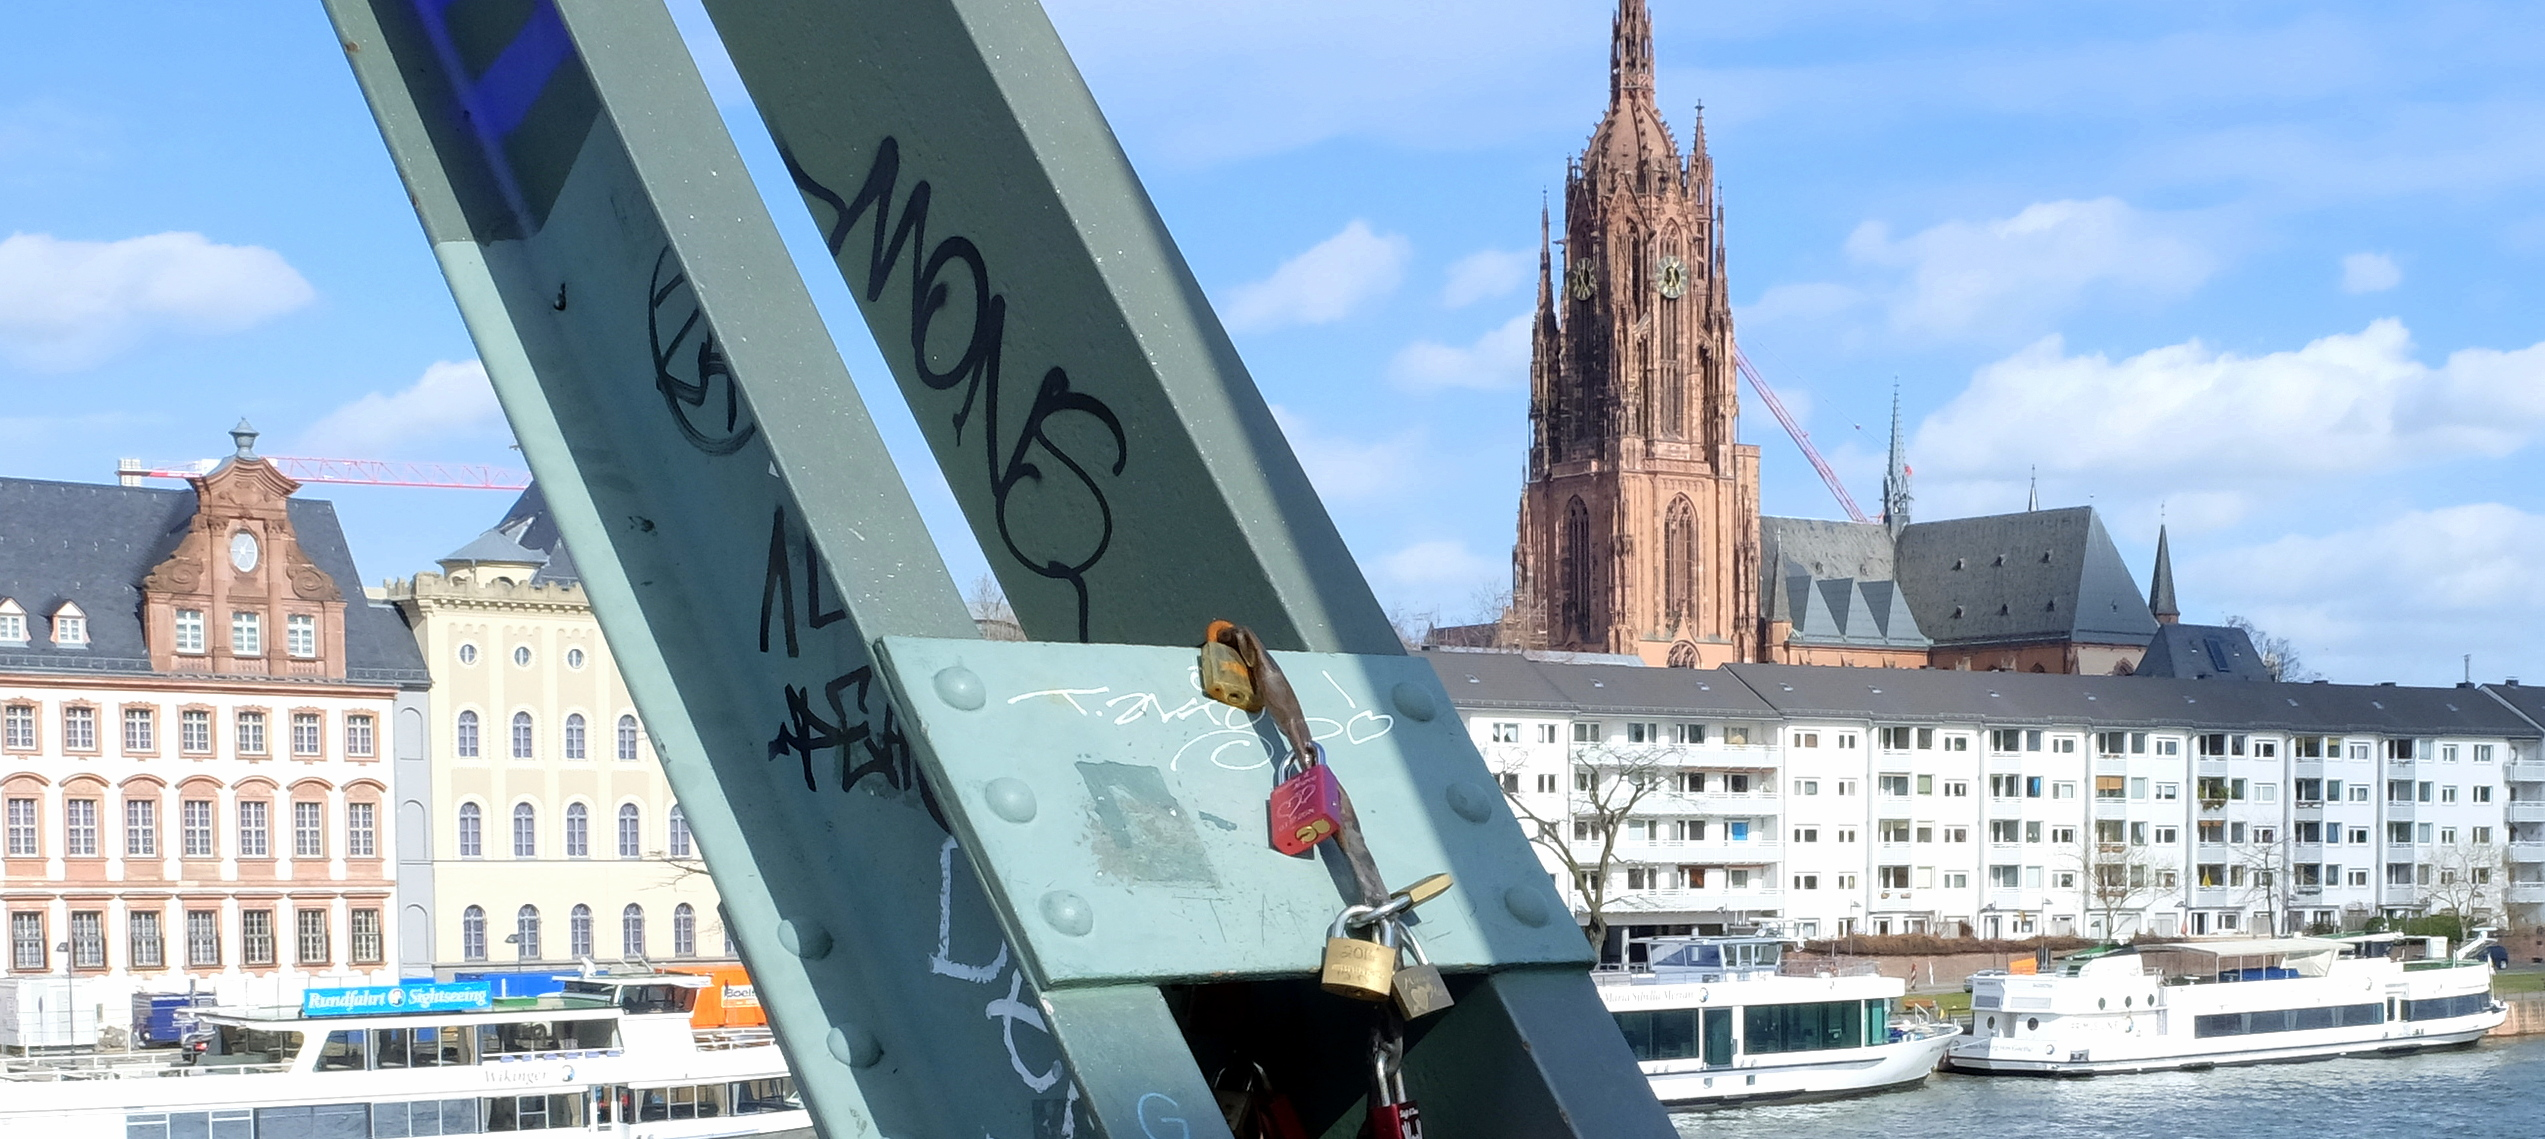 Frankfurt Dom with its 95m tower